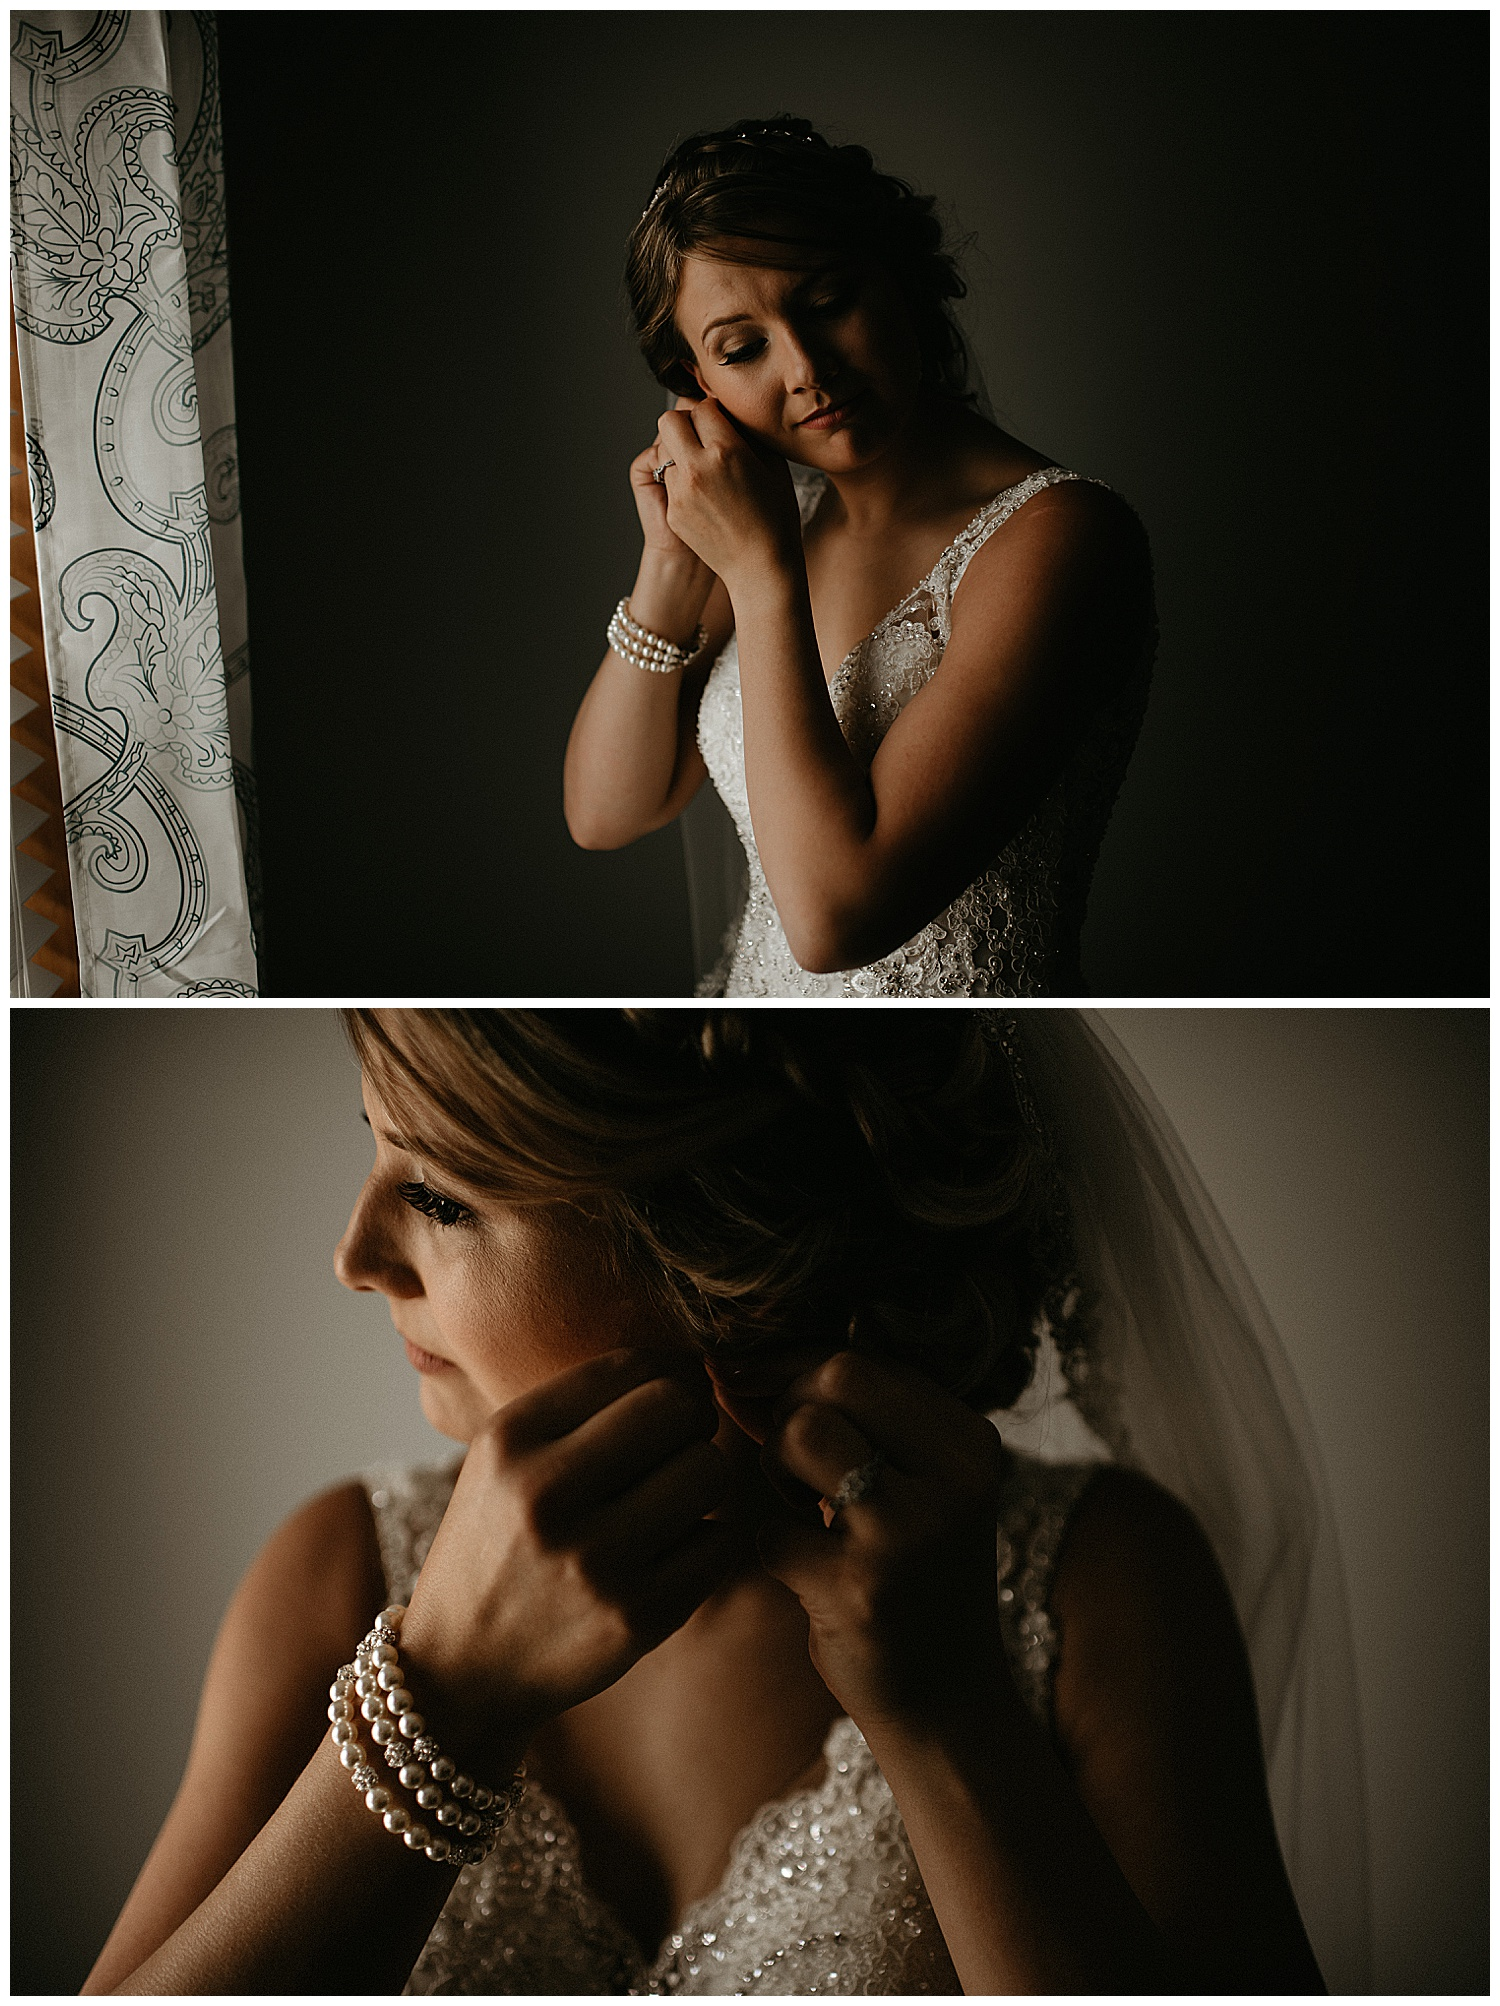 NEPA-Lehigh-Valley-Wedding-Photographer-at-Fountain-Springs-Country-Inn-Ashland-PA_0016.jpg